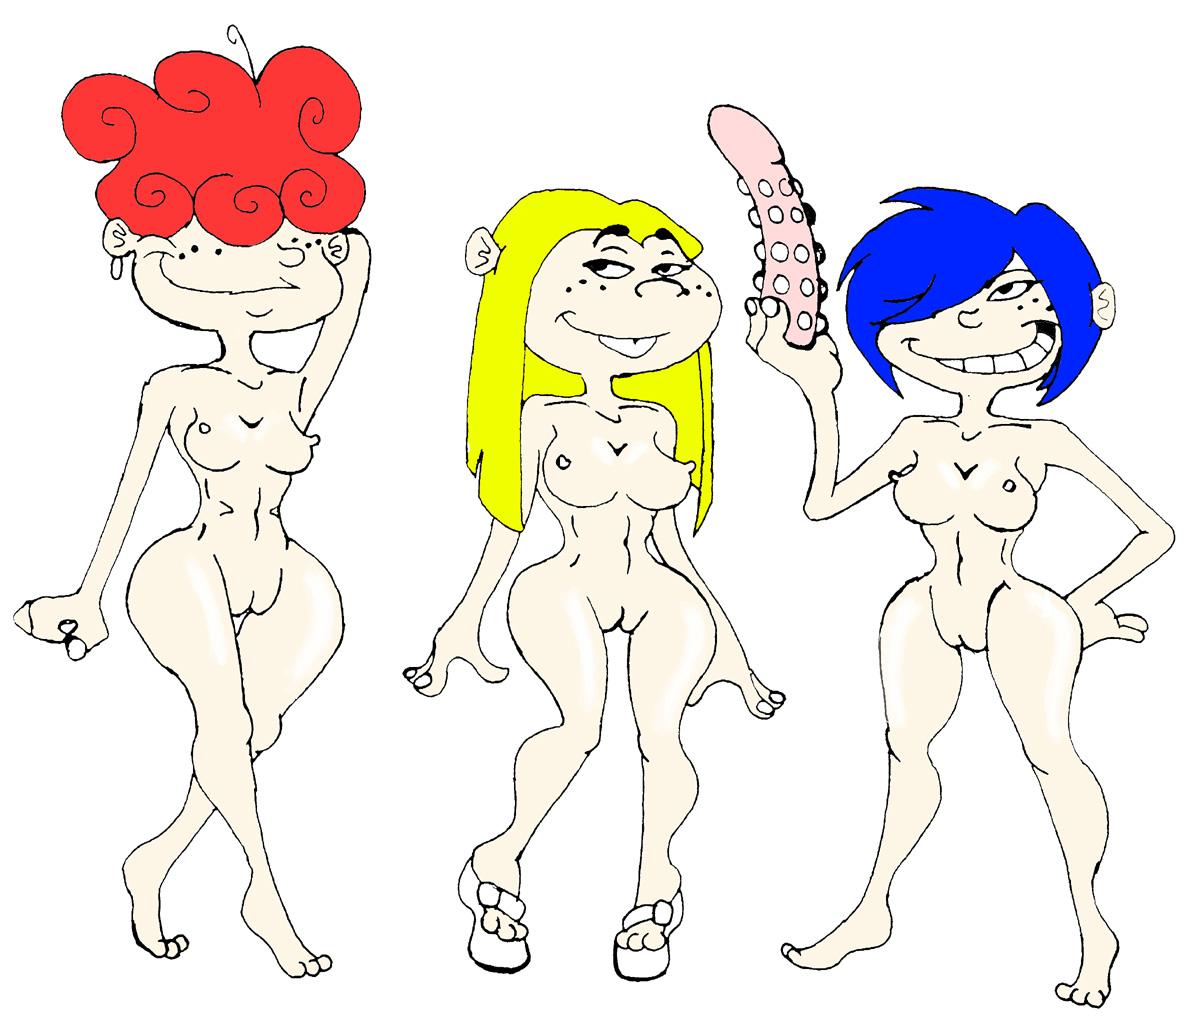 Kanker Sister Cartoon Porn